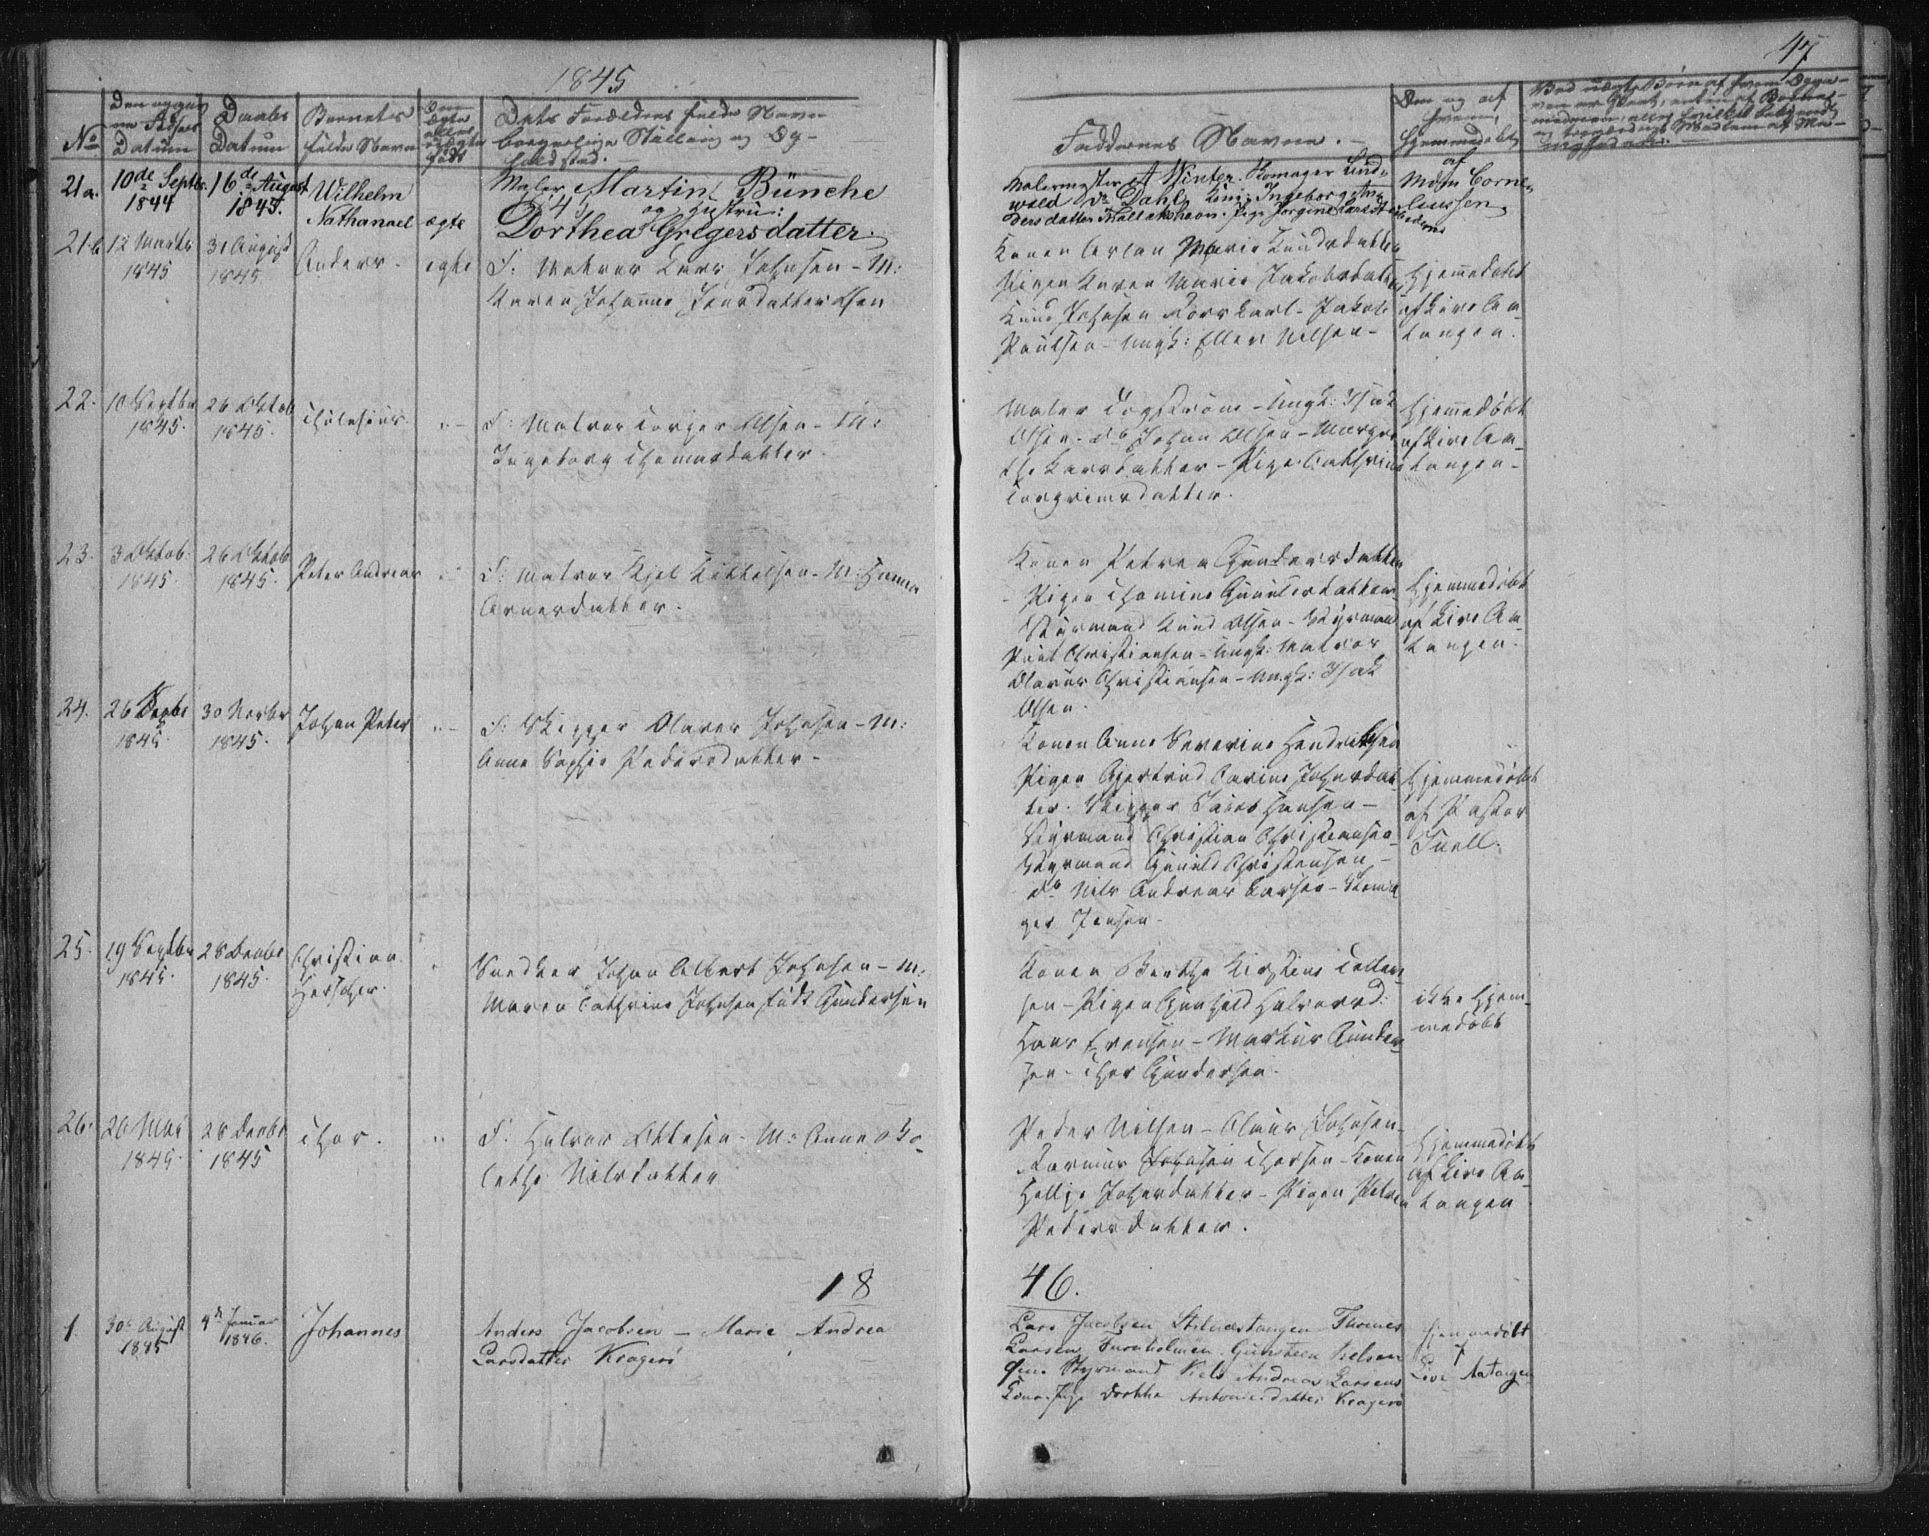 SAKO, Kragerø kirkebøker, F/Fa/L0005: Ministerialbok nr. 5, 1832-1847, s. 47